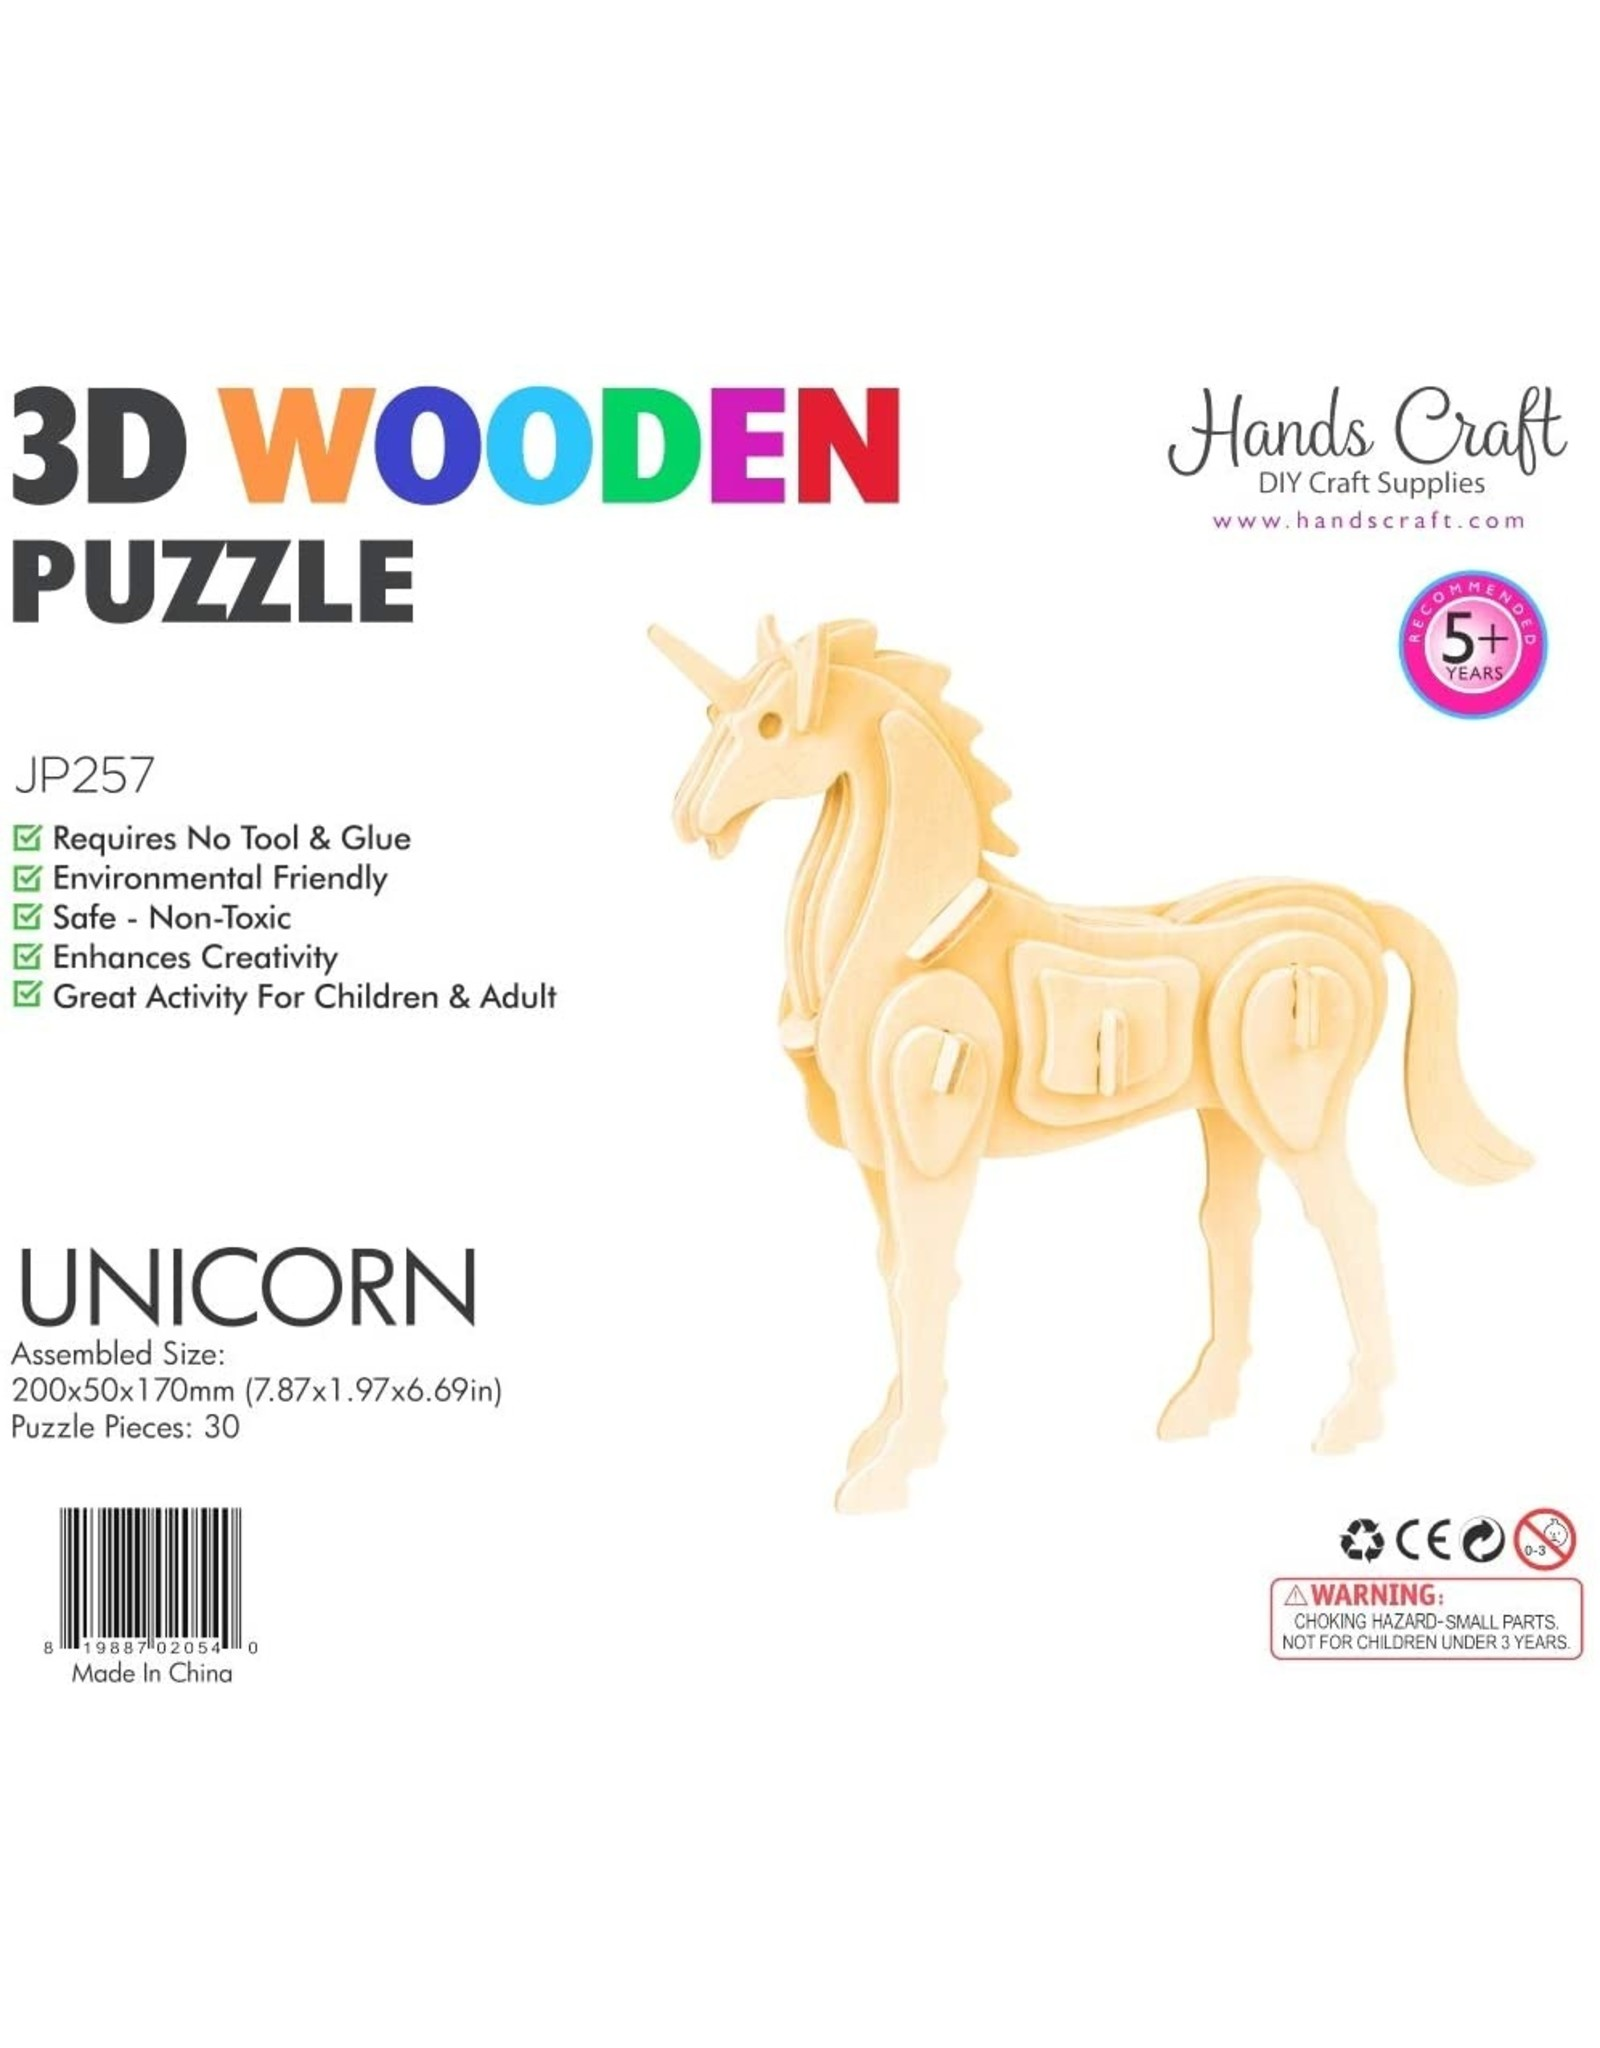 Hands Craft 3D Wooden Puzzle - Unicorn